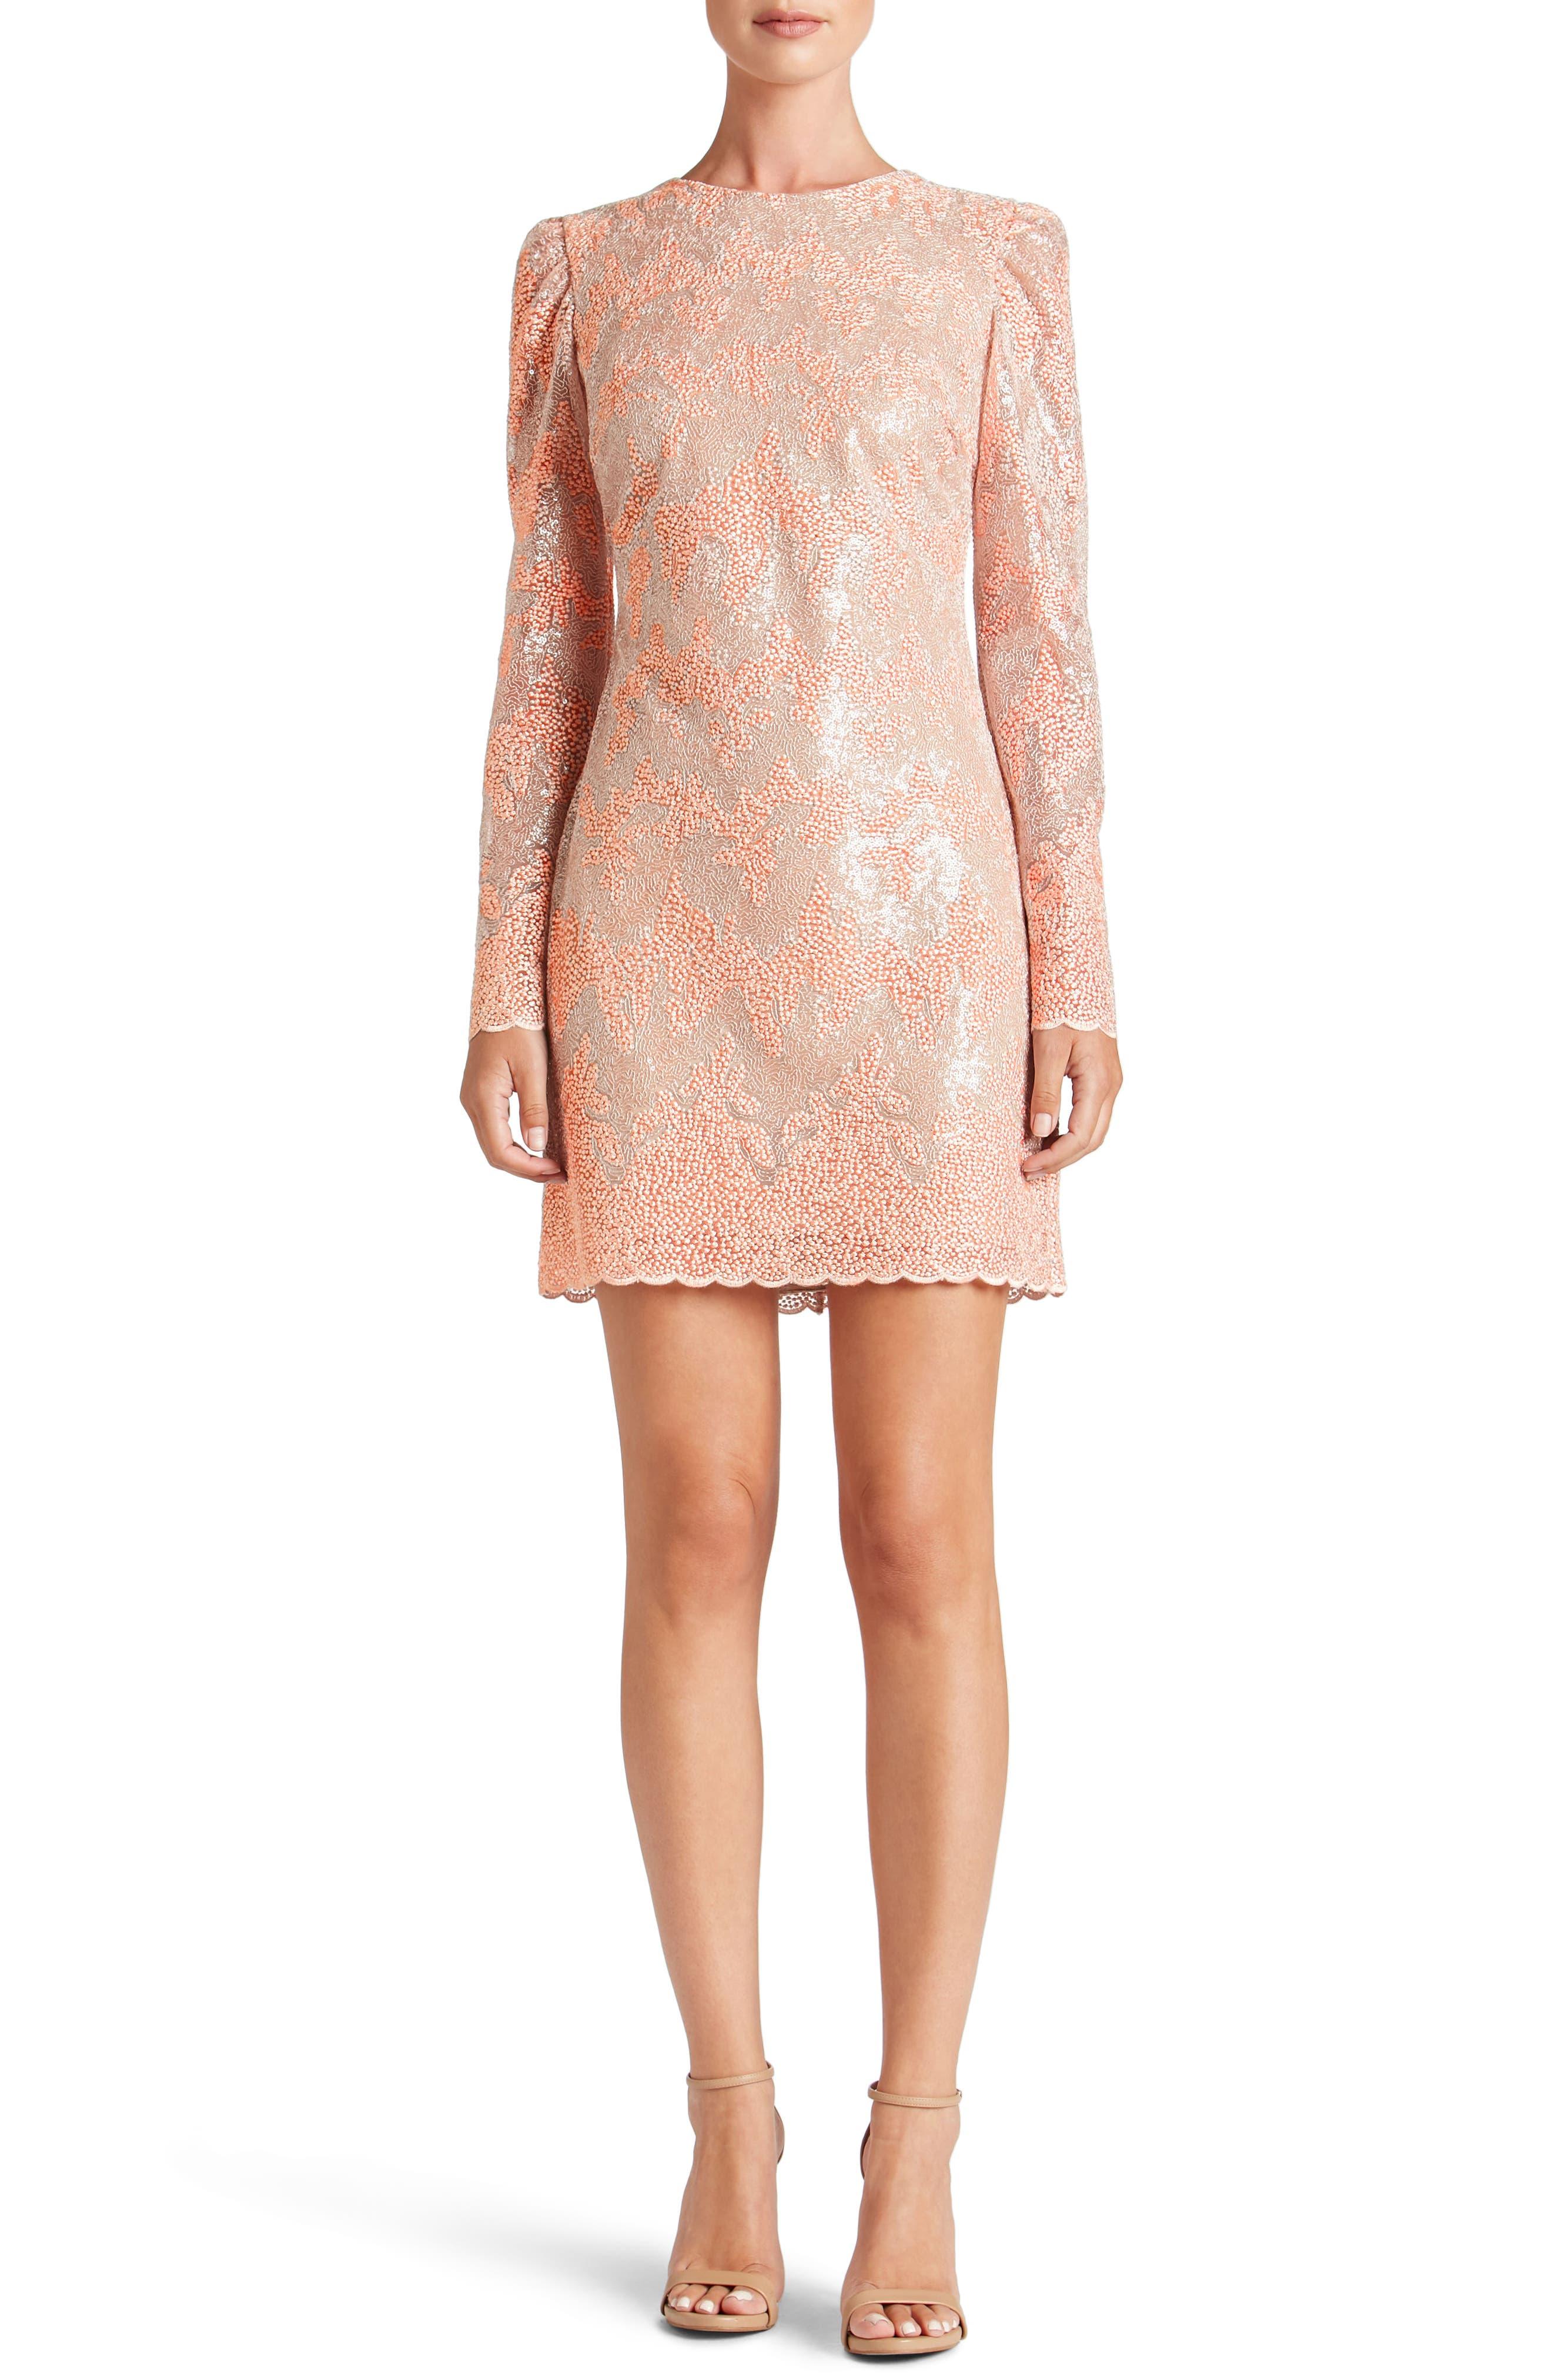 Aubry Sequin Embellished Shift Dress,                         Main,                         color, 686